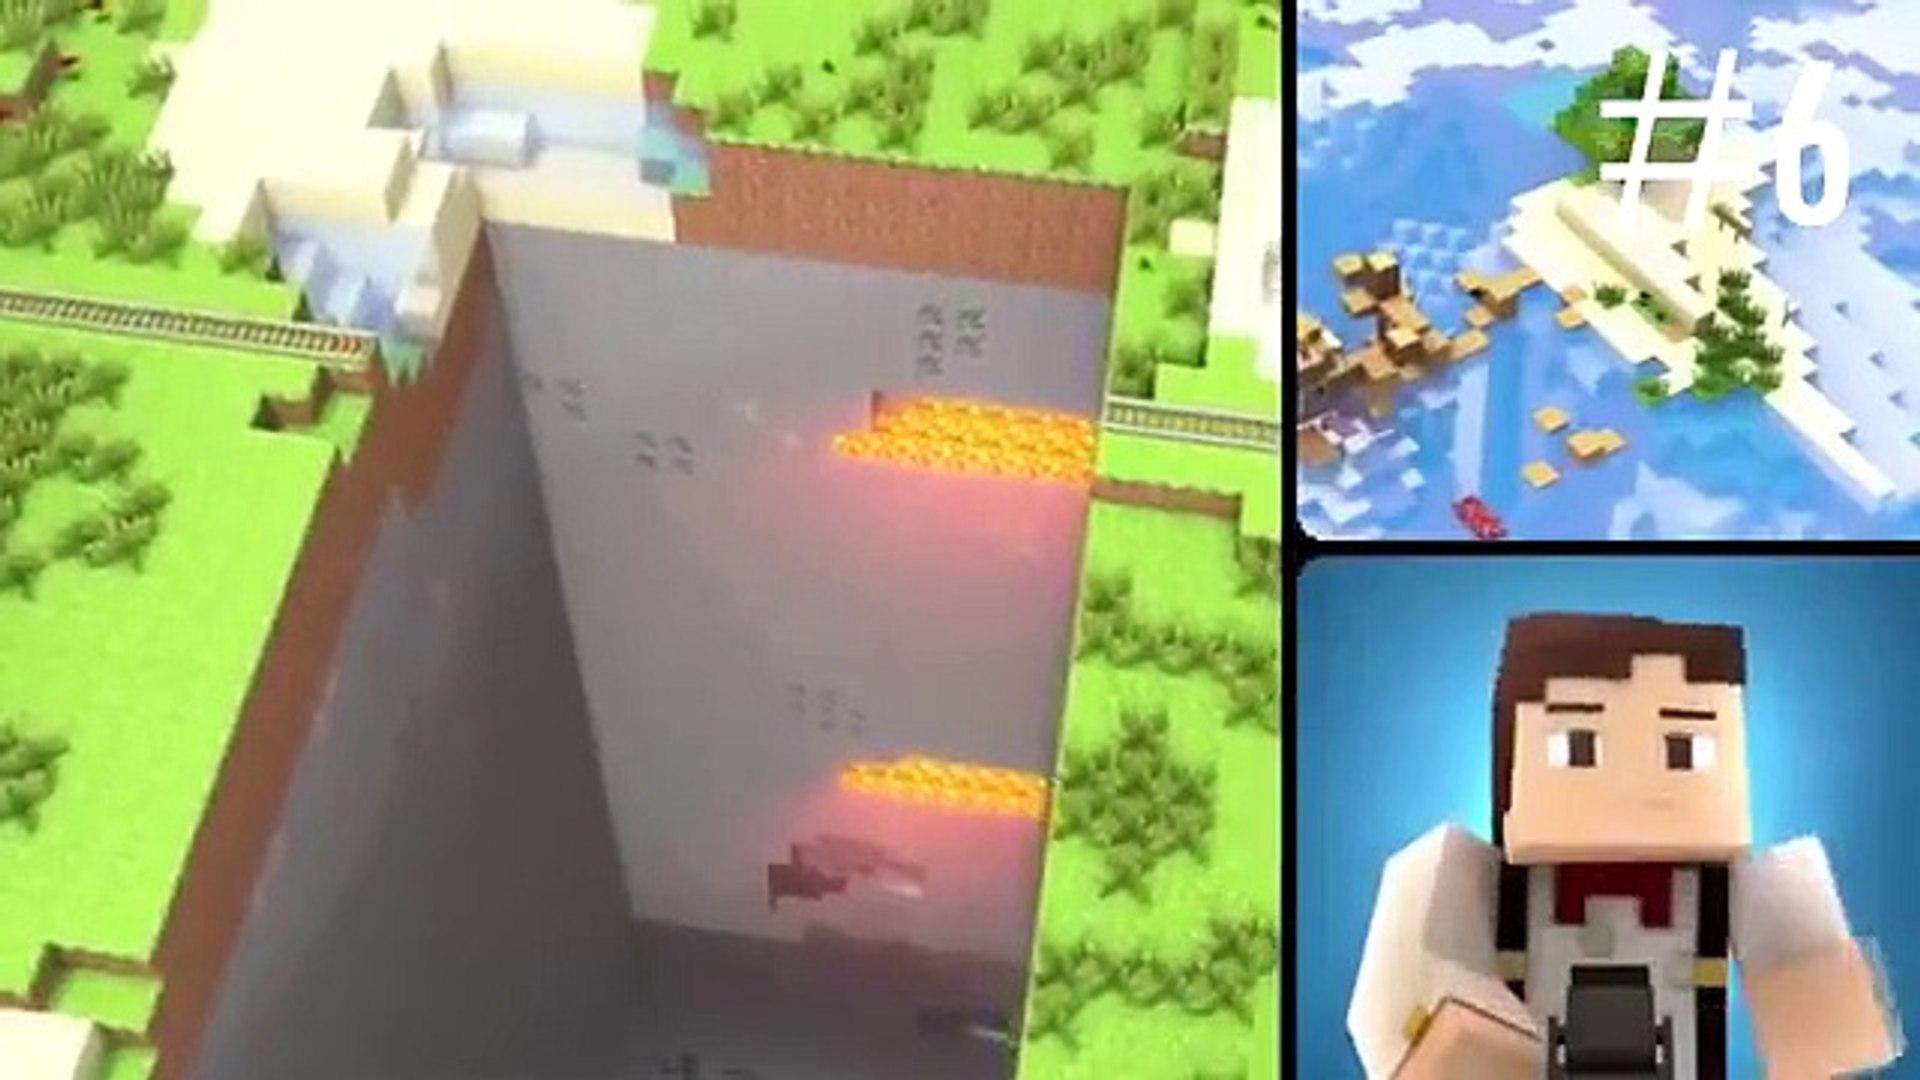 ♪ Top 10 Minecraft Song Animation Parody - Best Minecraft Songs Animations Parodies 2015